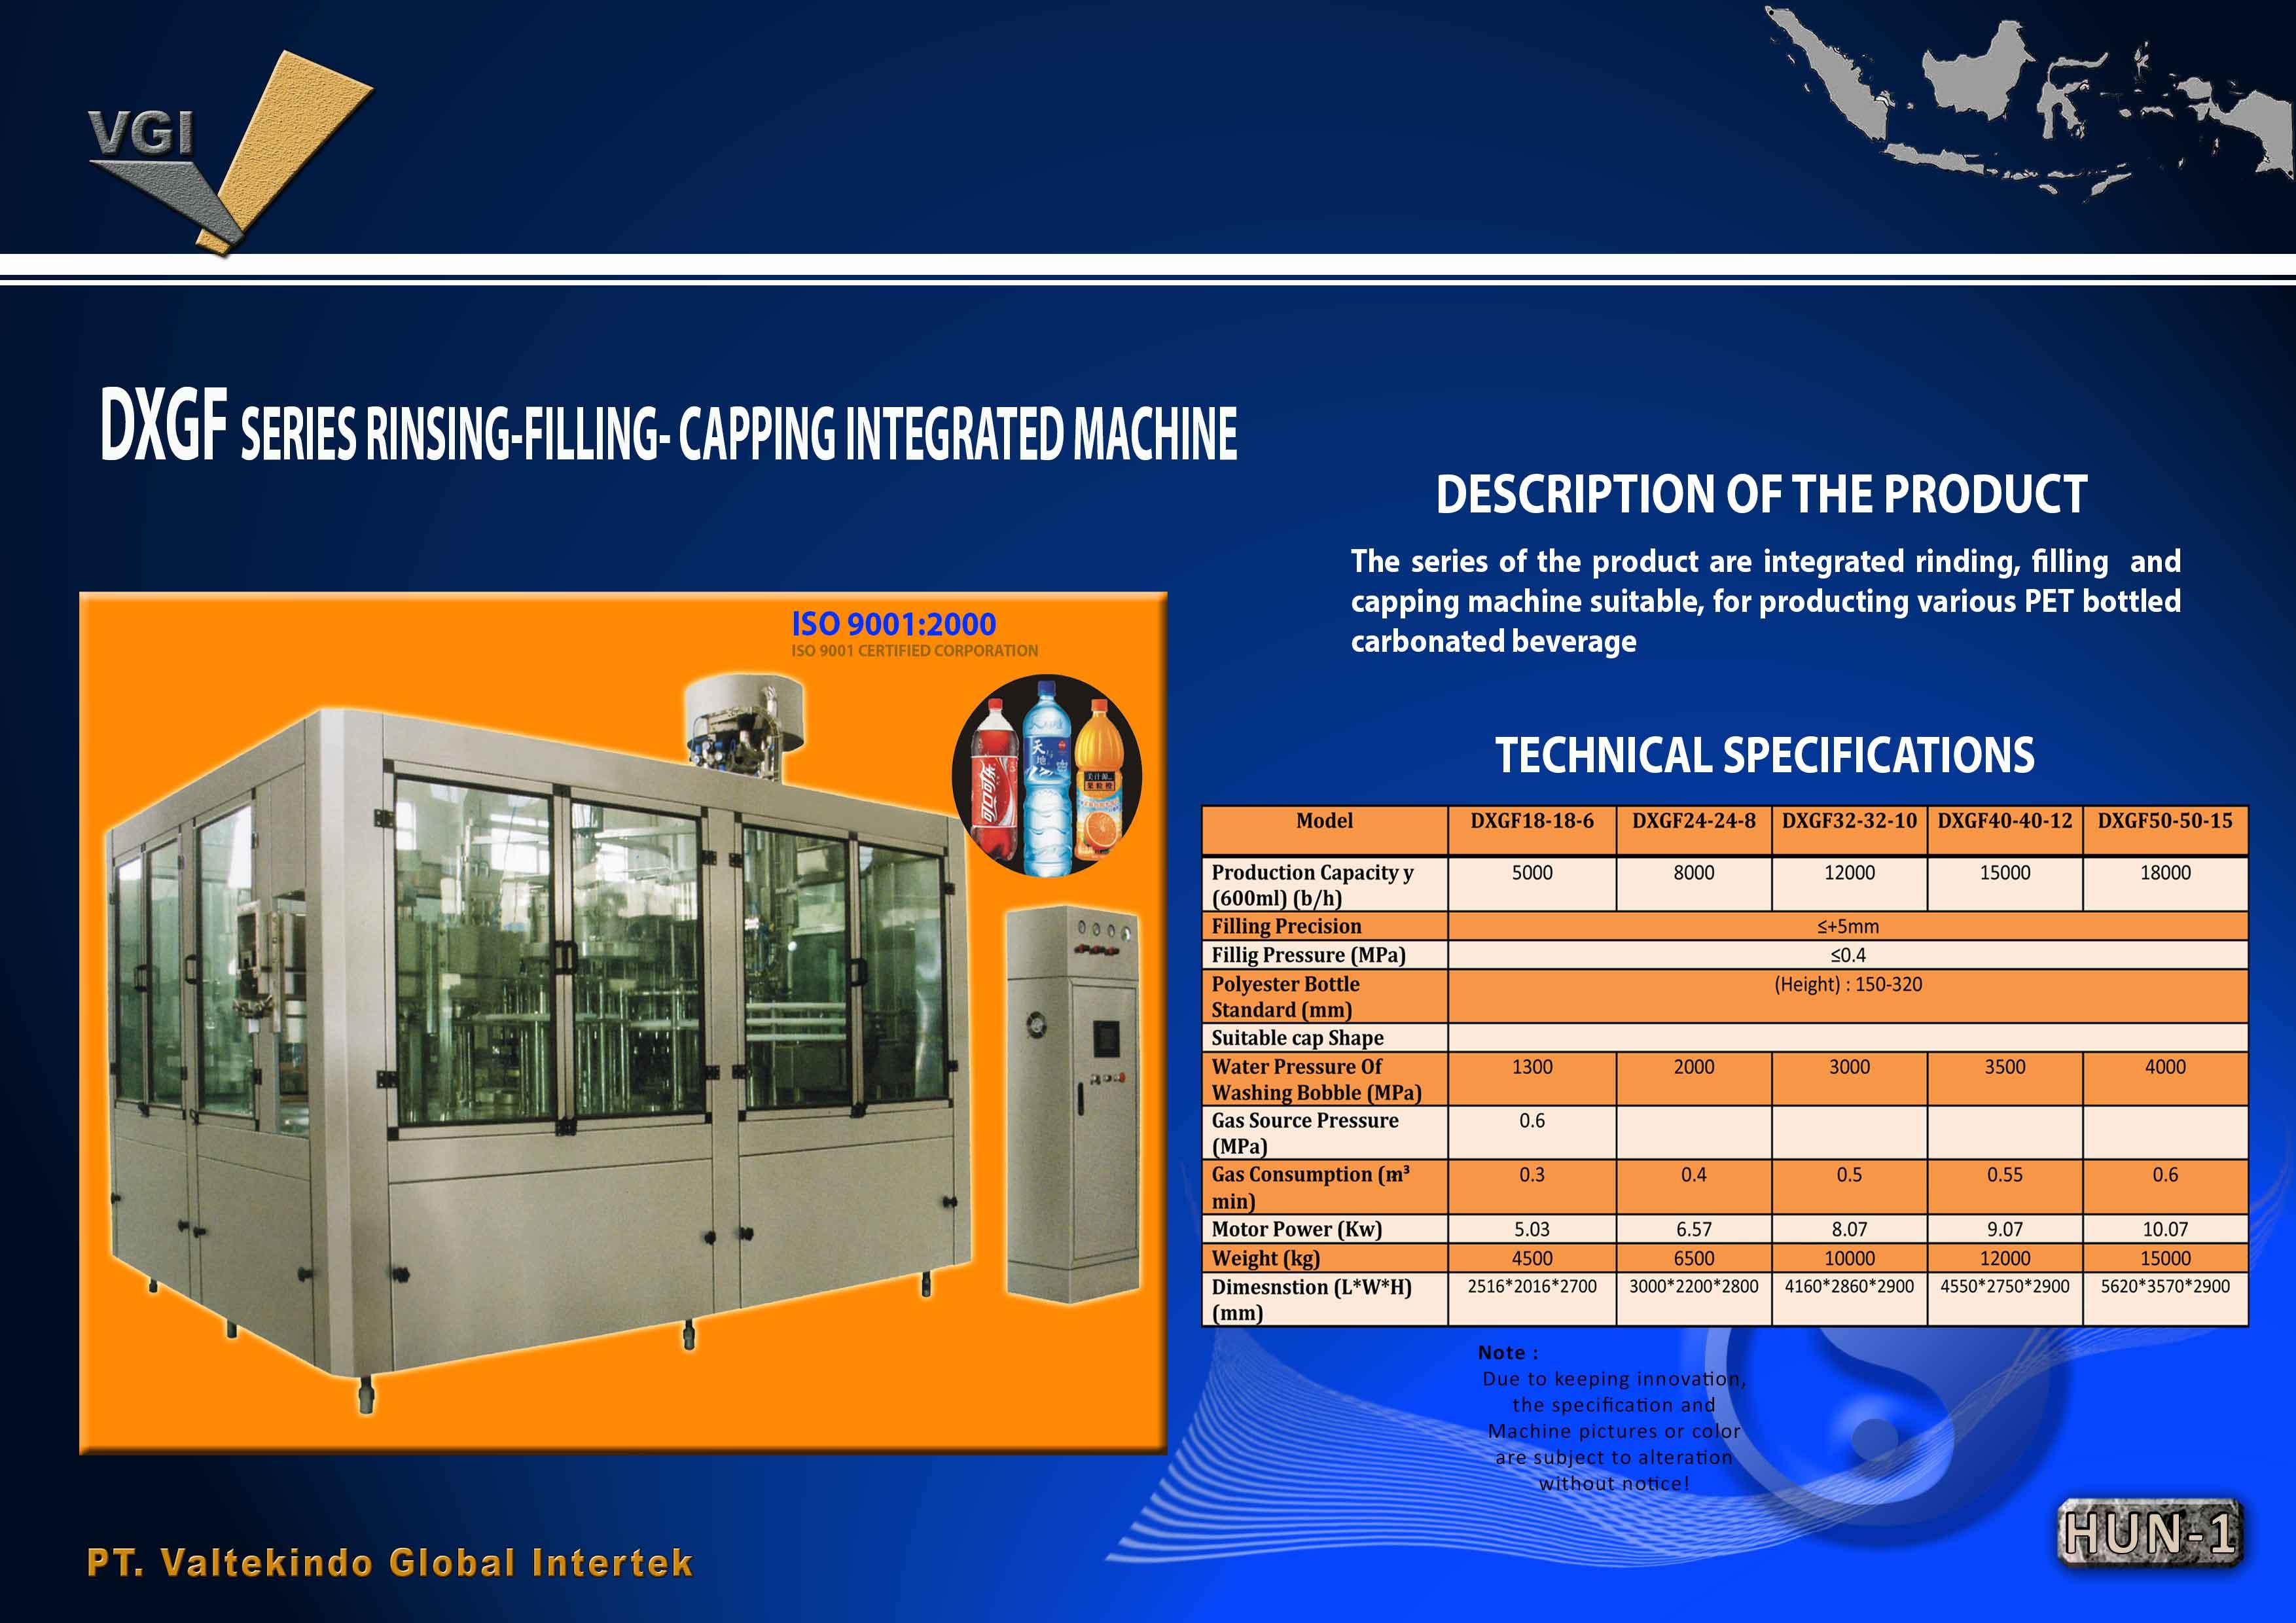 jual mesin RINSING-FILLING-CAPPING INTREGRATED MACHINE RINSING-FILLING-CAPPING INTREGRATED MACHINE